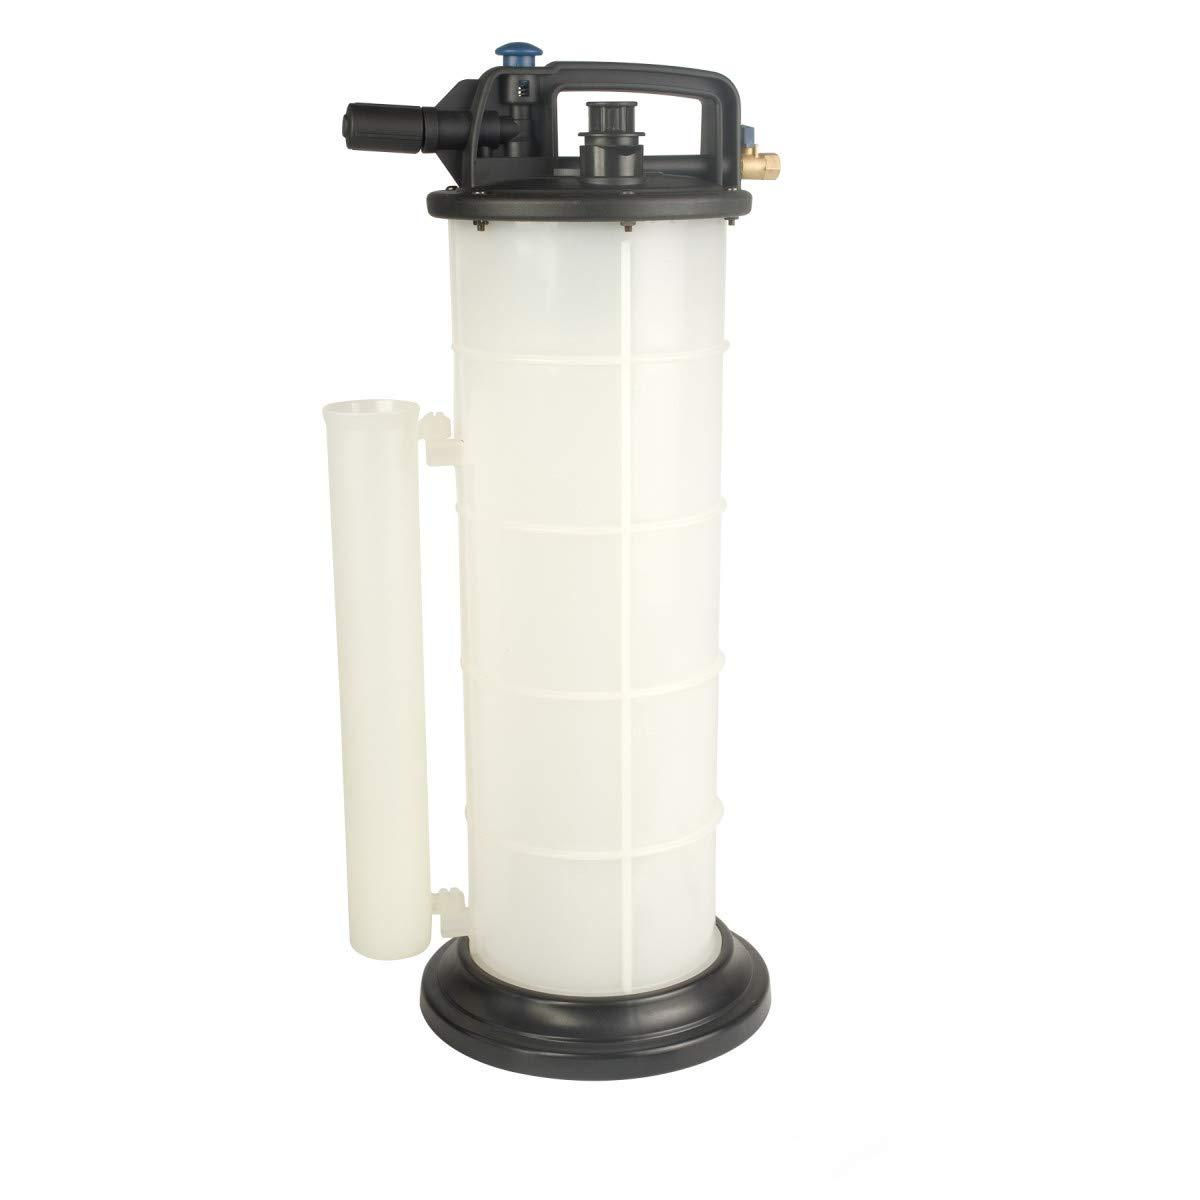 STEELMAN 95219 Air Operation Fluid Evacuator - 9 Liter Capacity